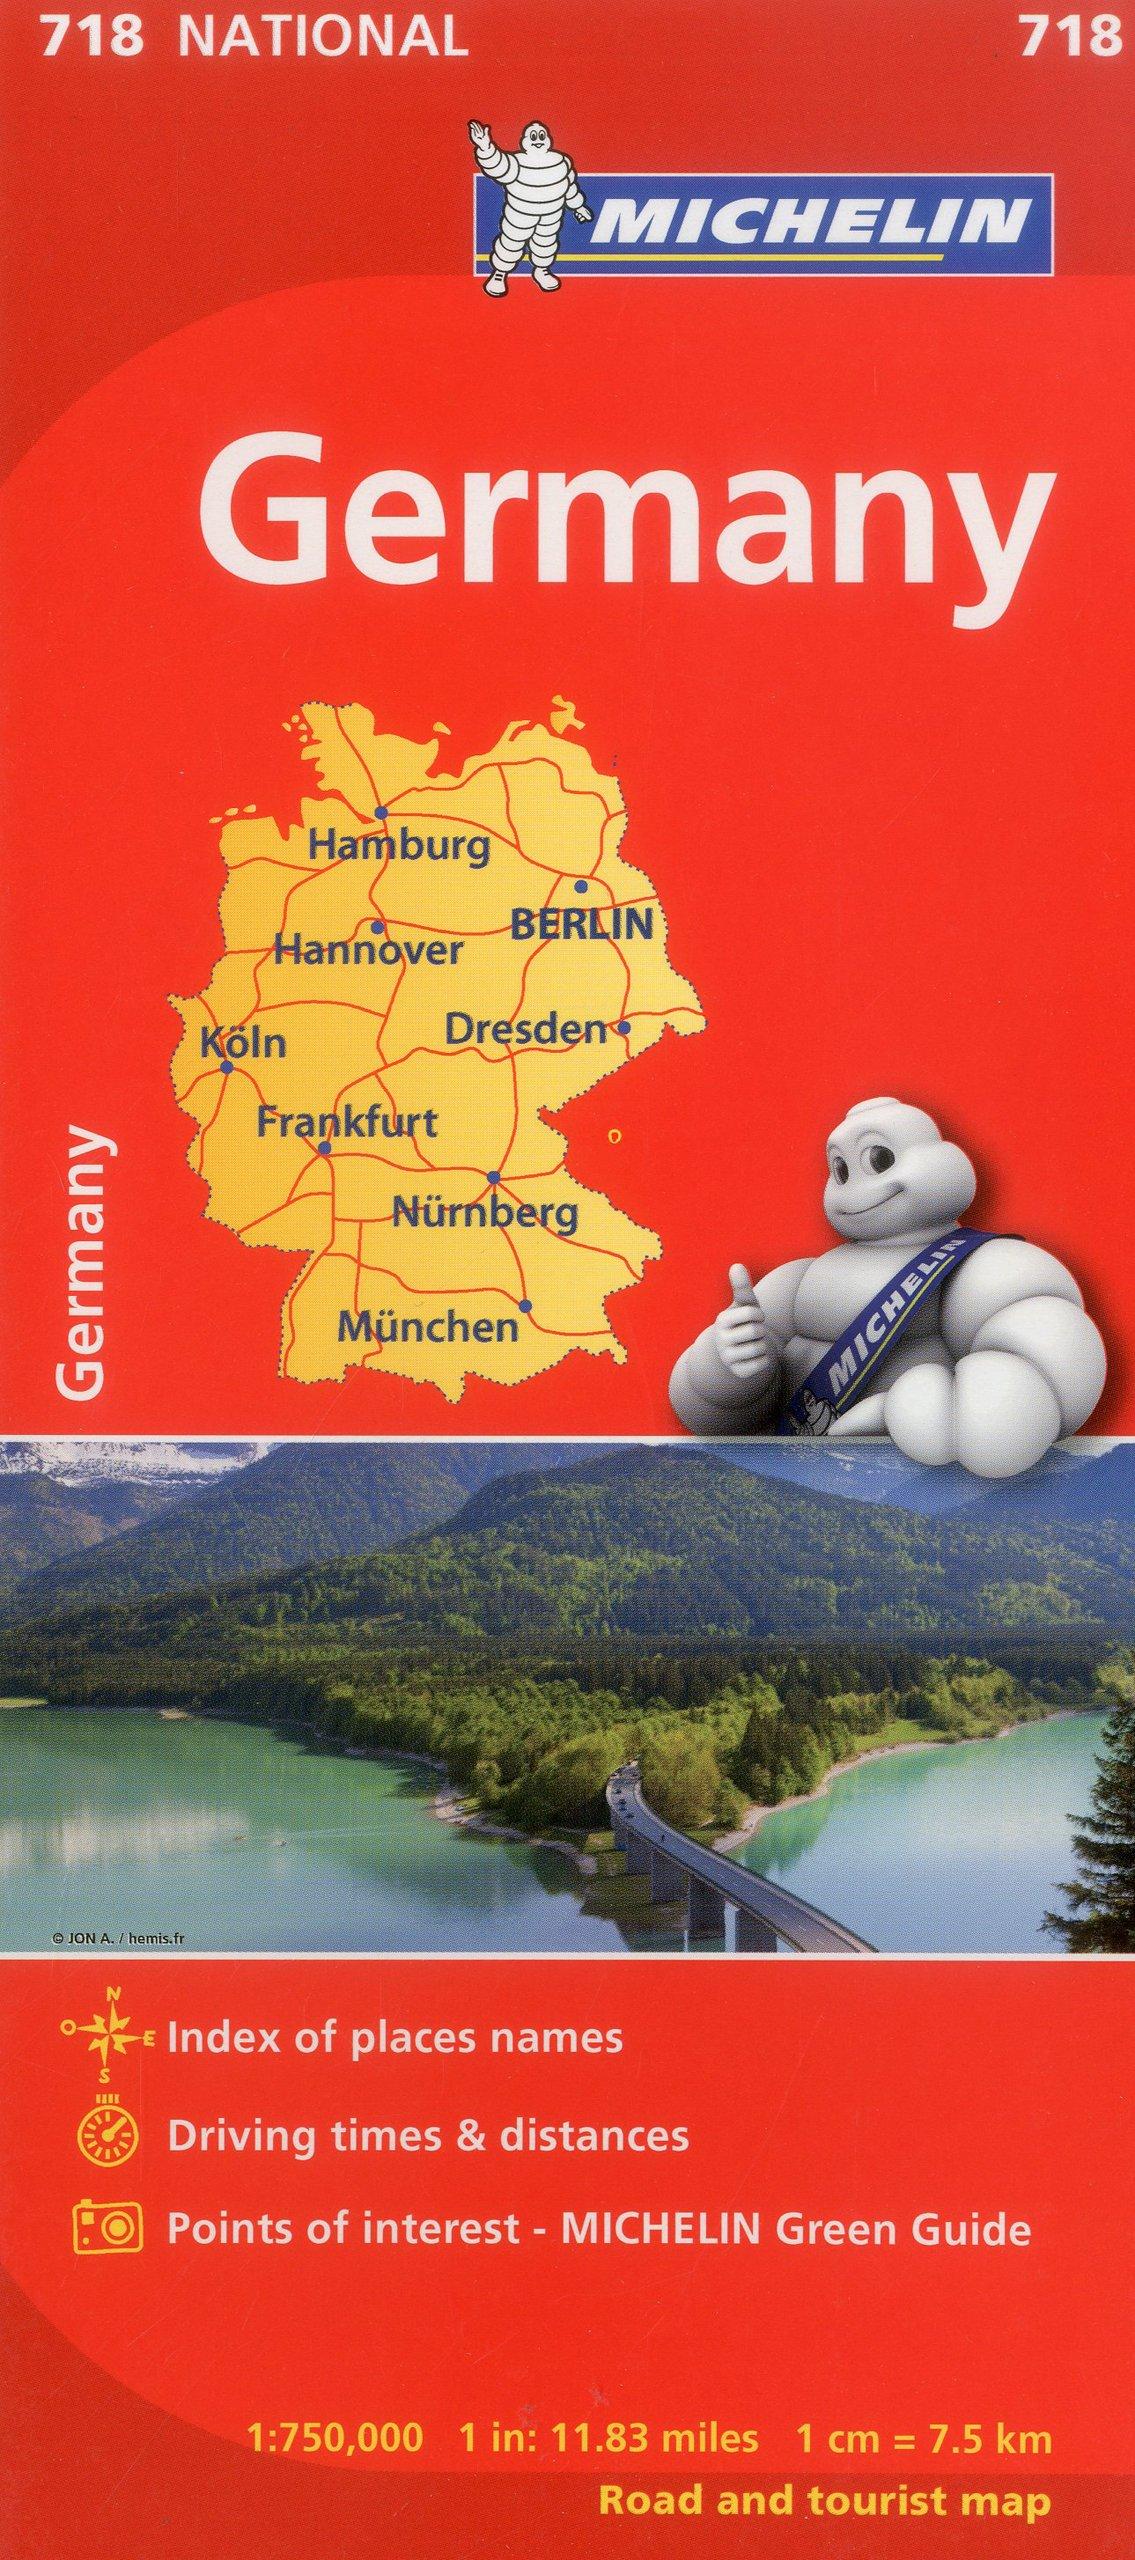 michelin germany map 718 mapscountry michelin michelin 9782067170834 amazoncom books